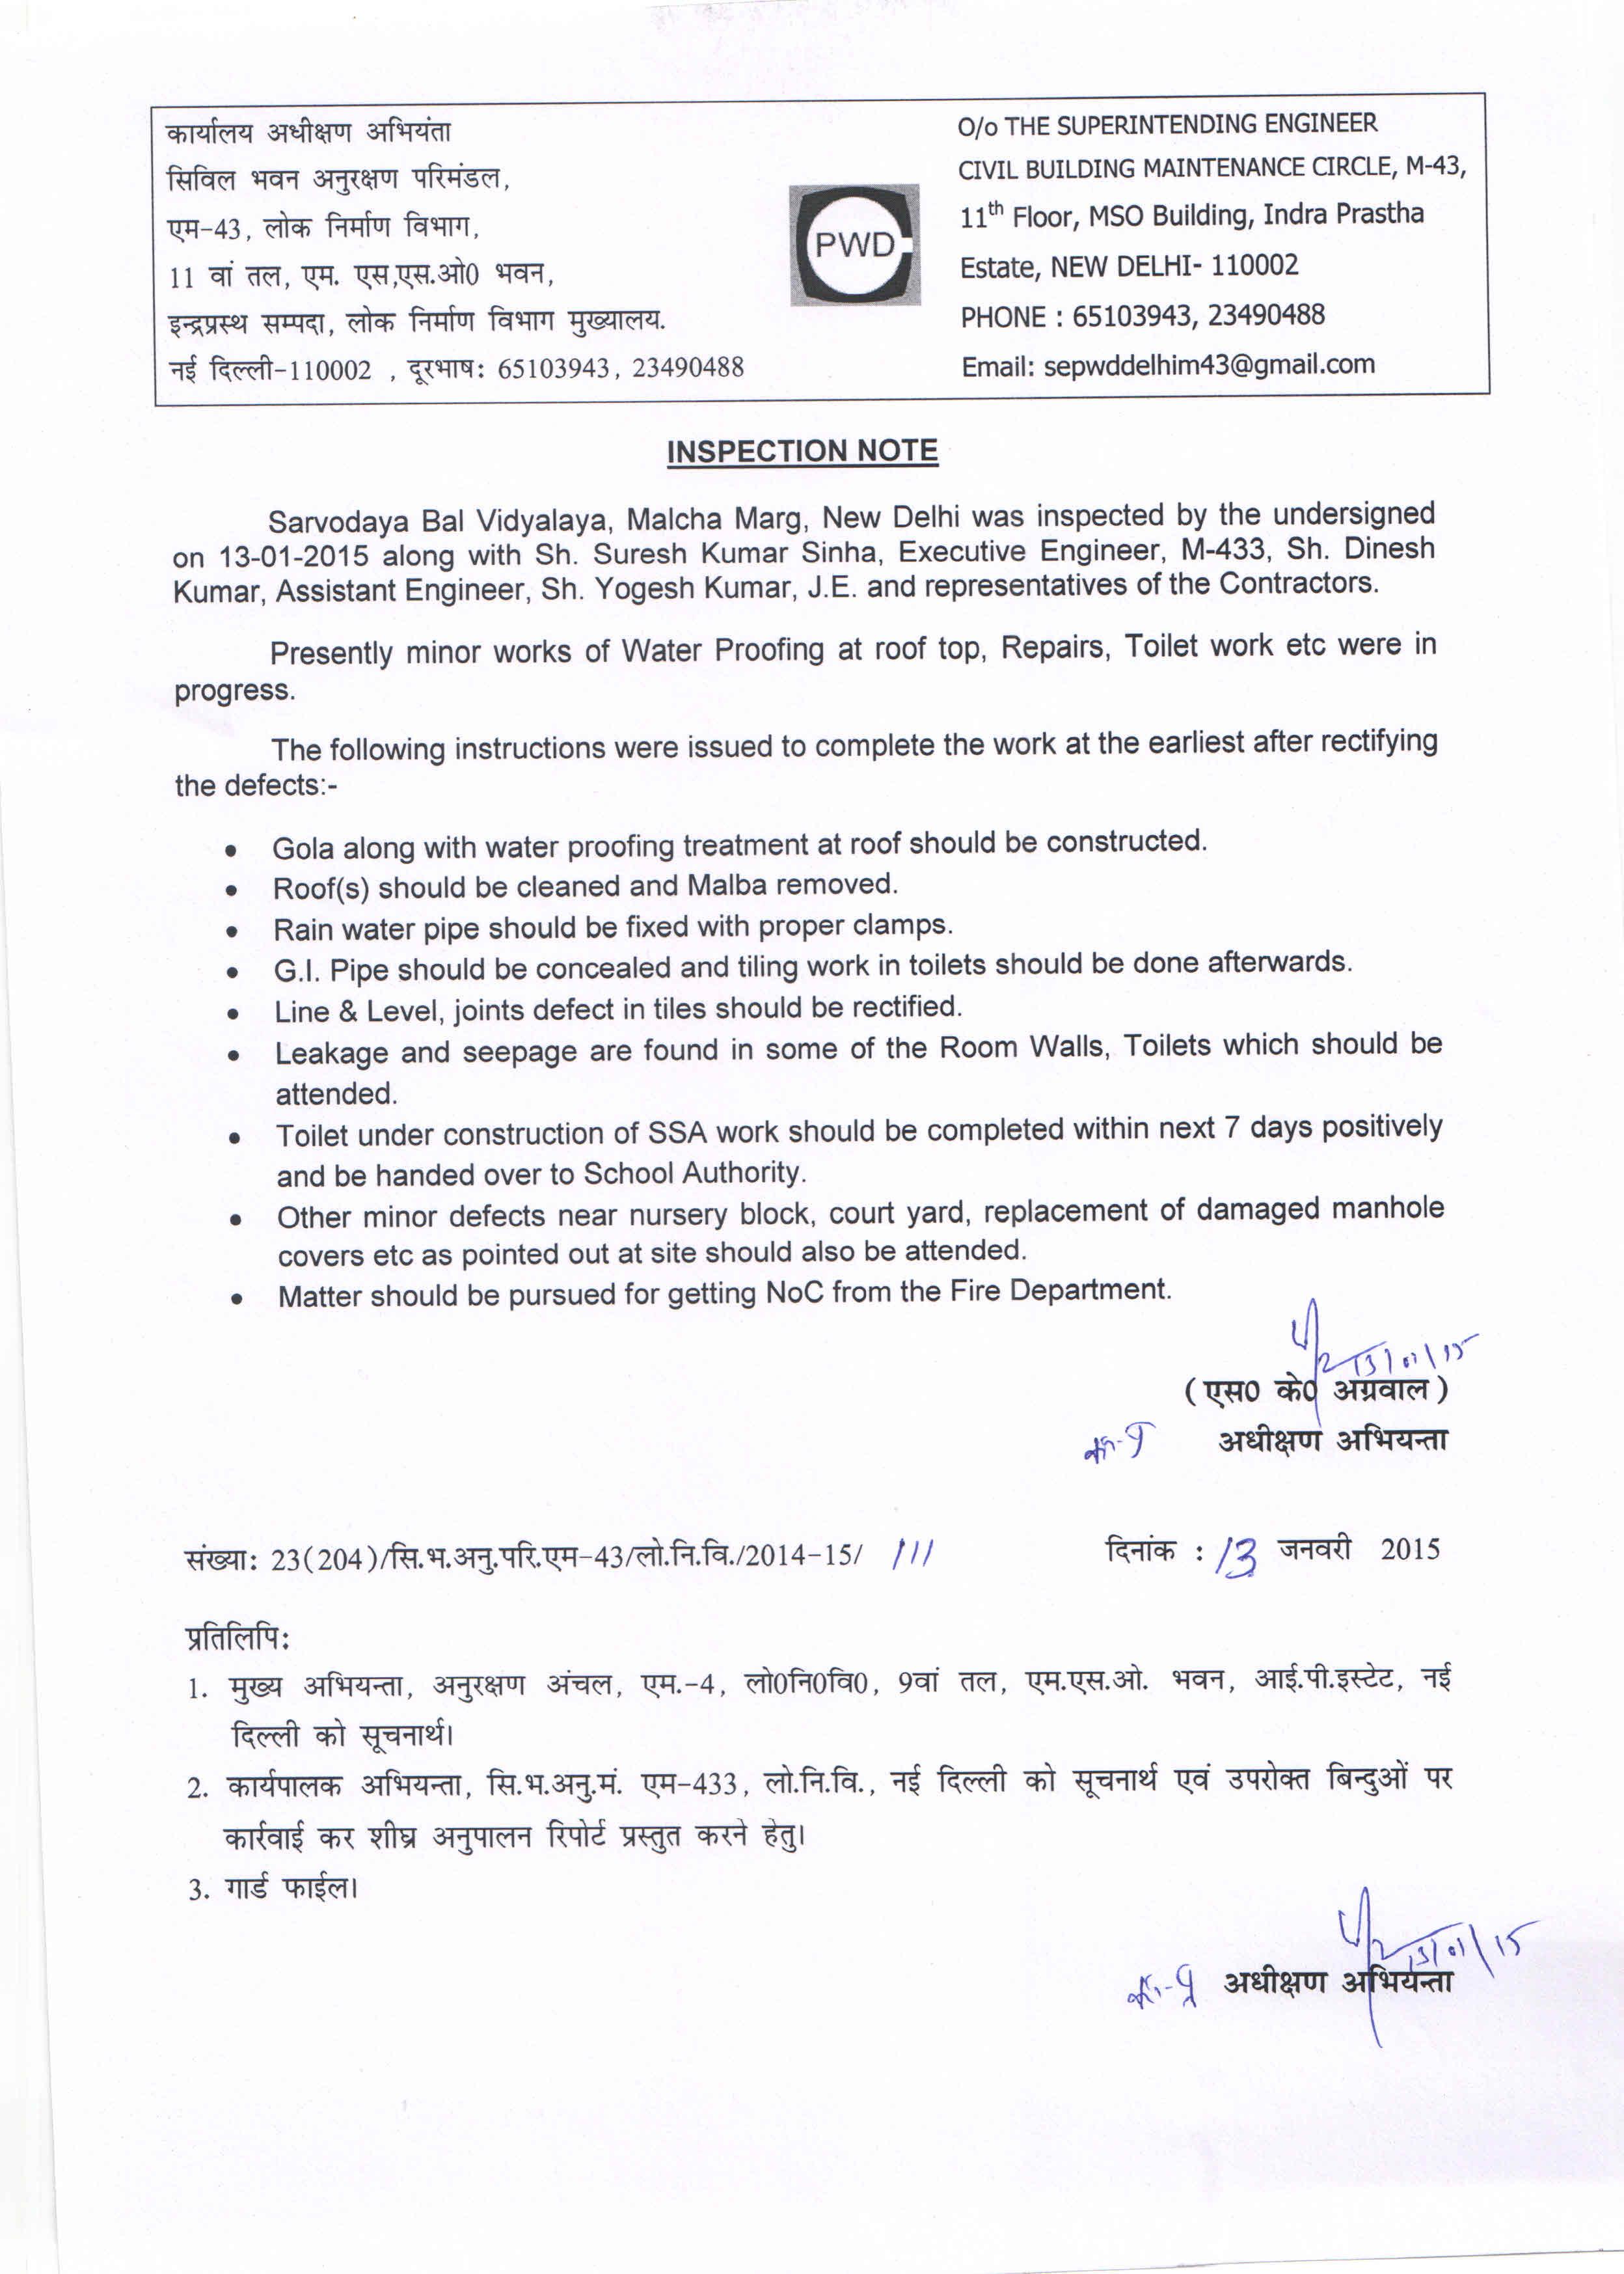 Public Works Department, Govt of NCT of Delhi